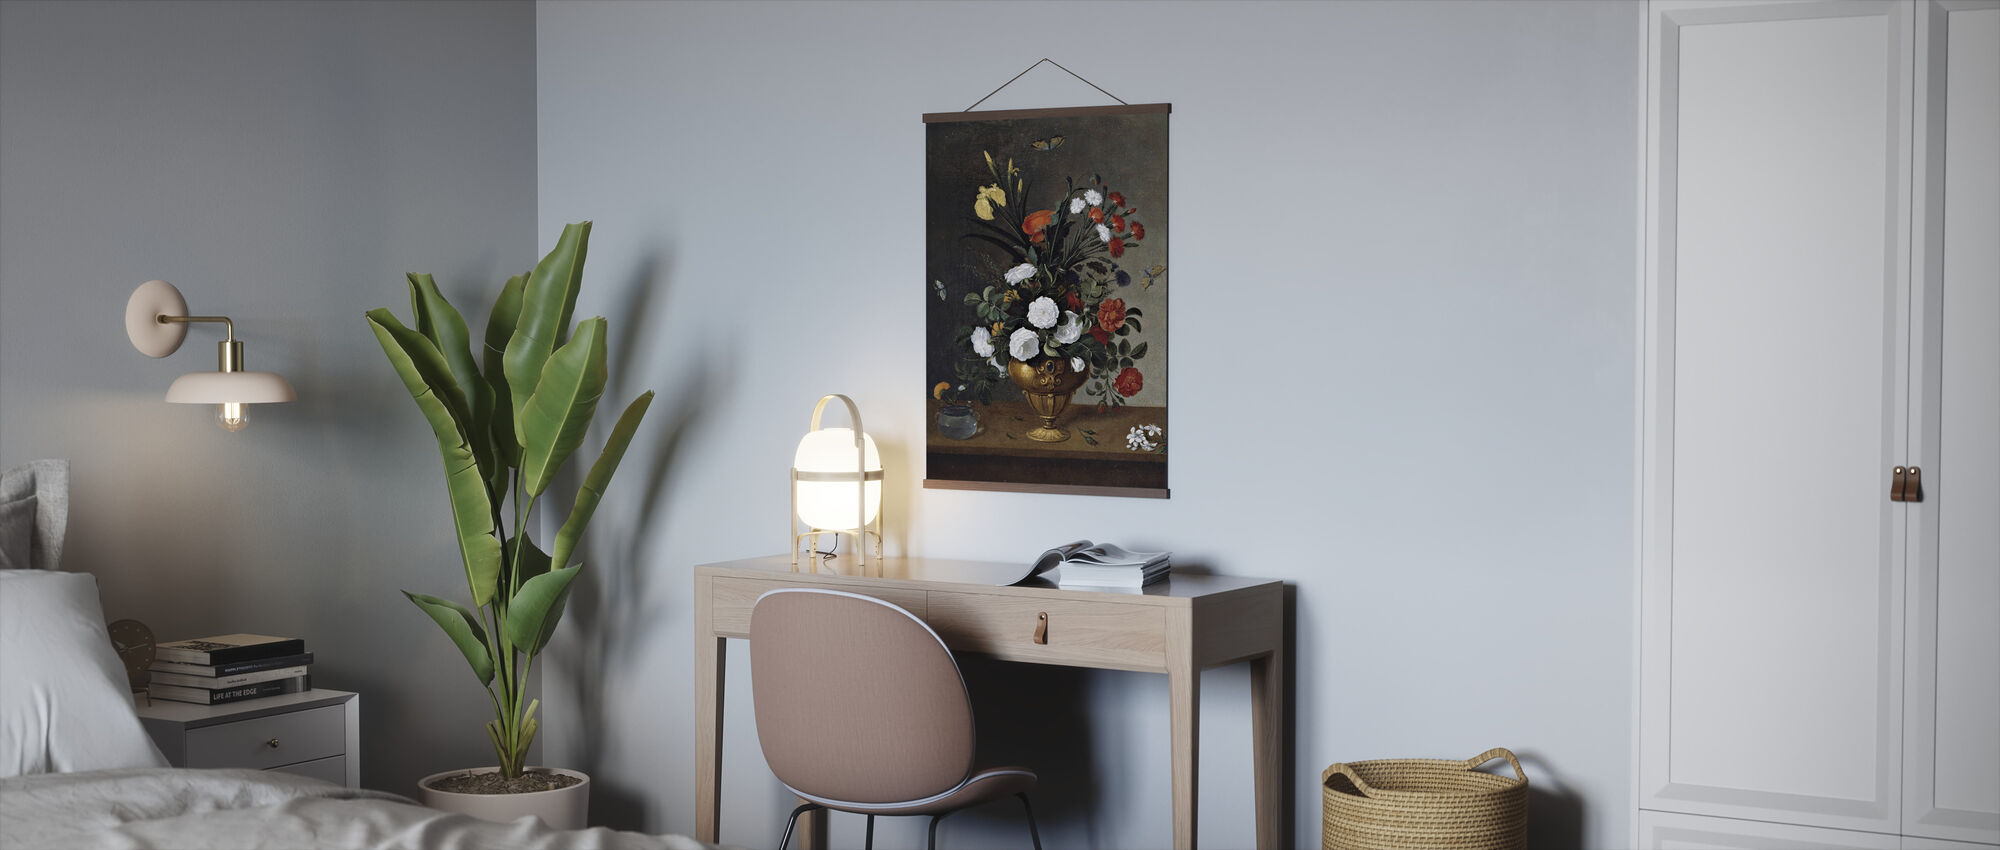 Flower Vase- Pedro Camprobin - Poster - Office